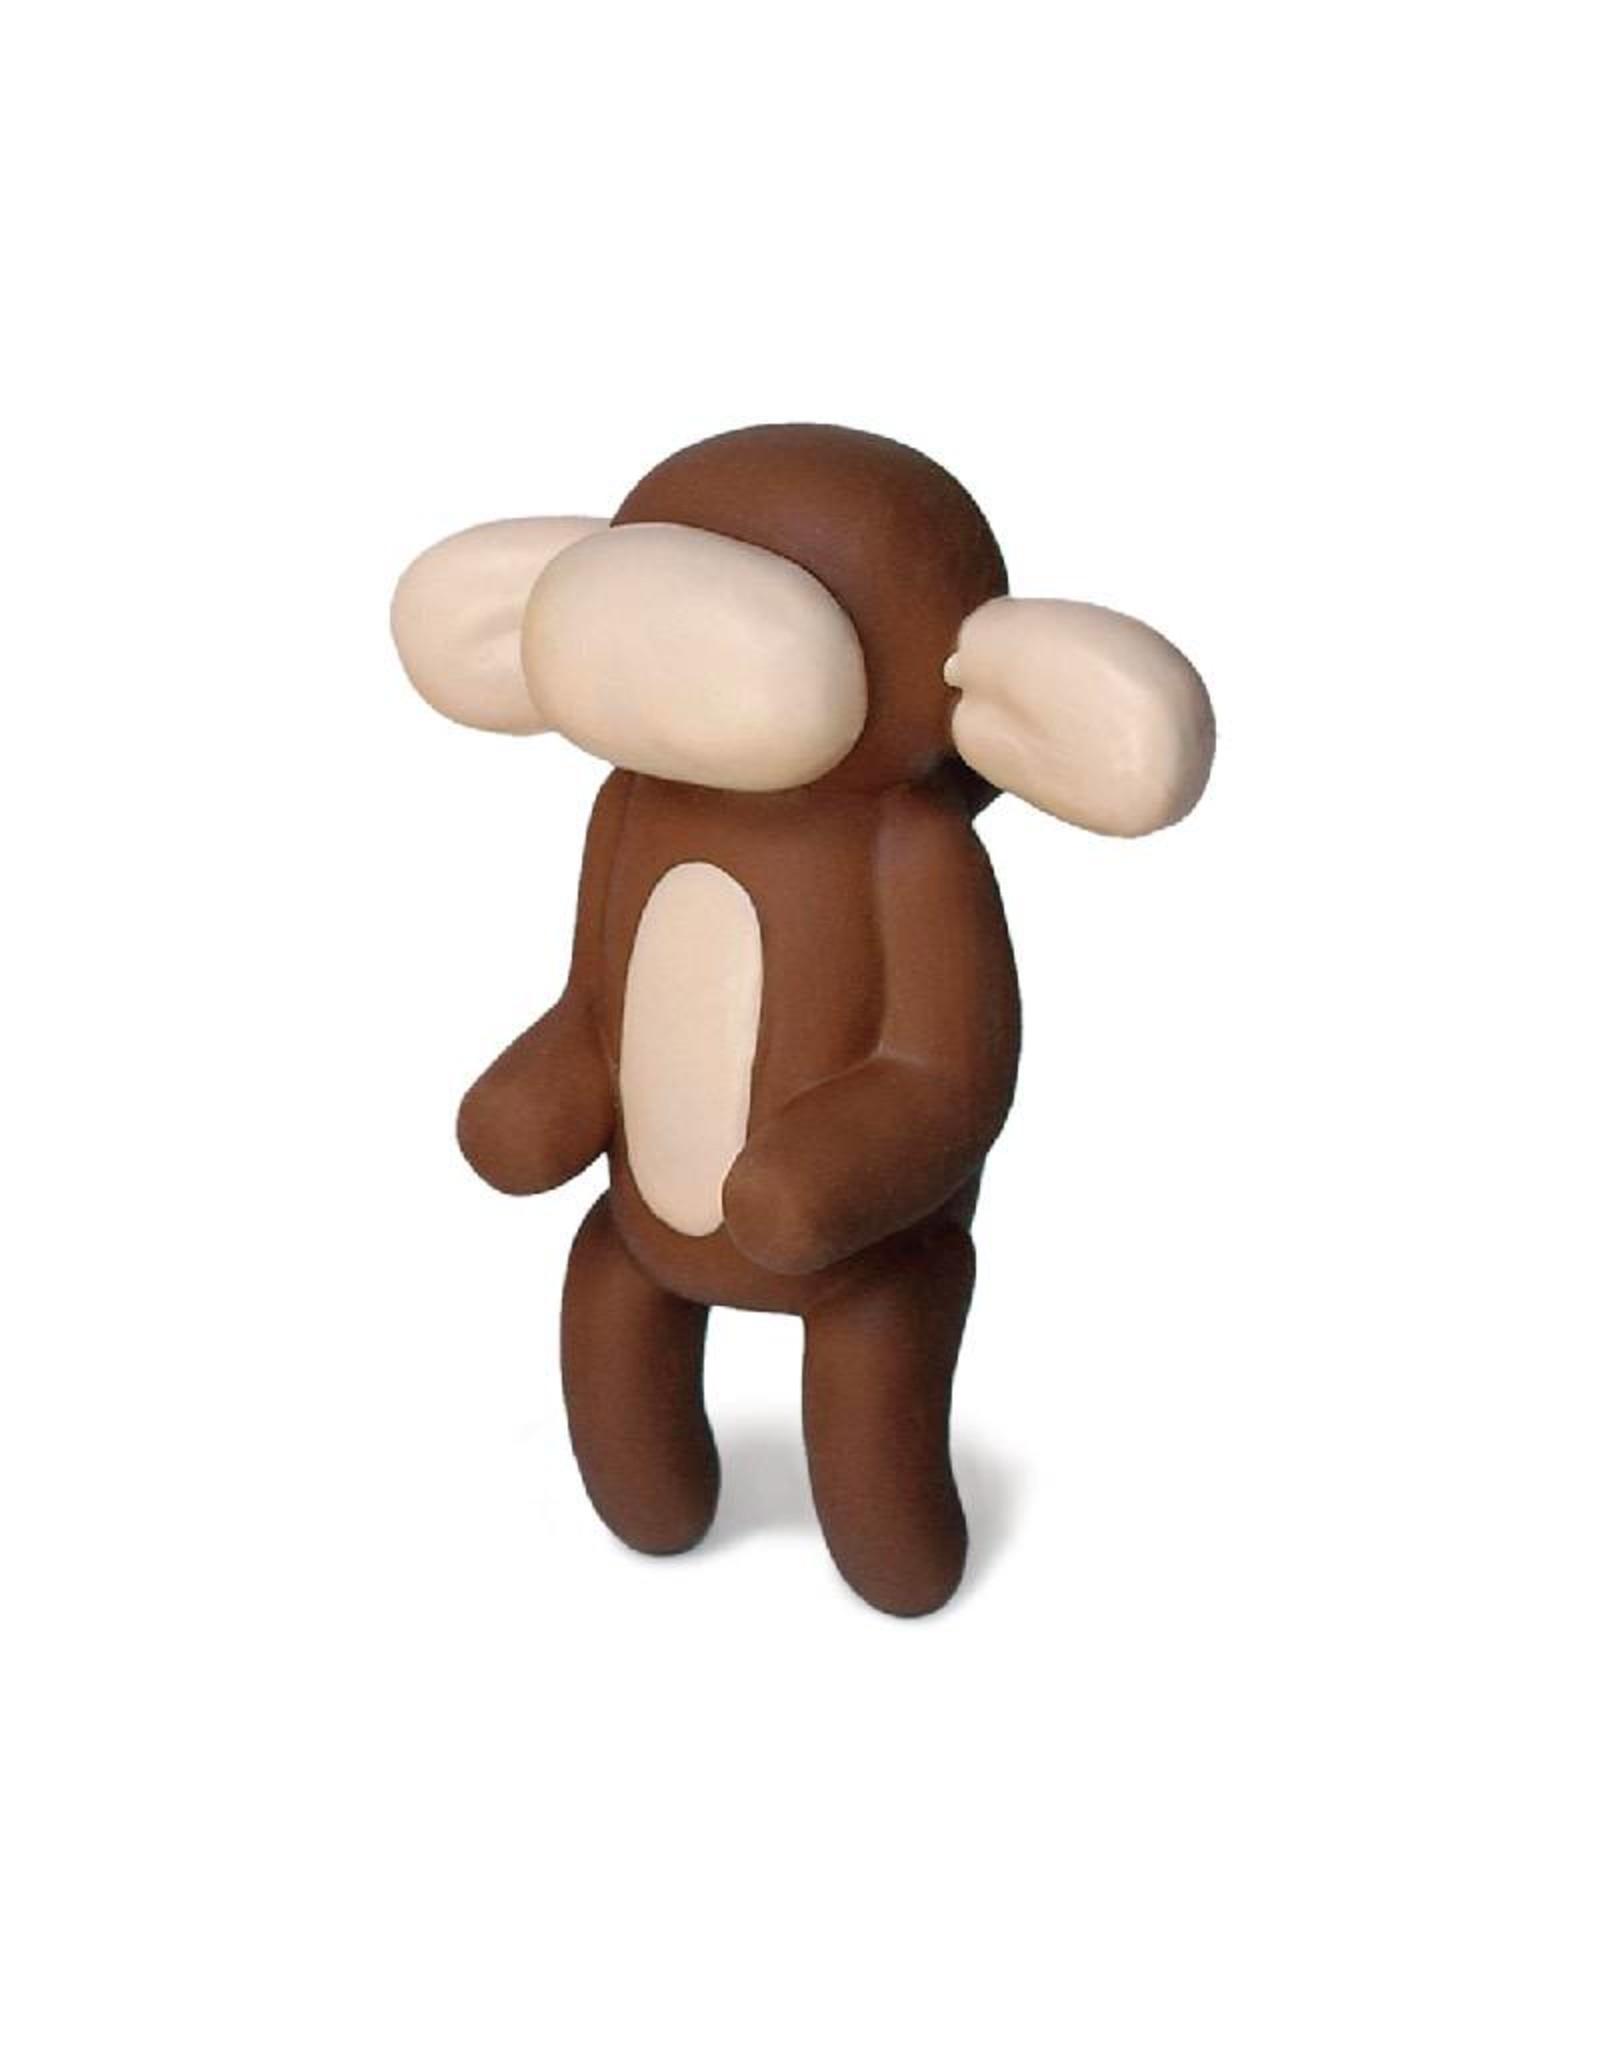 Charming Pet Charming Pet | Balloon Dog Toys